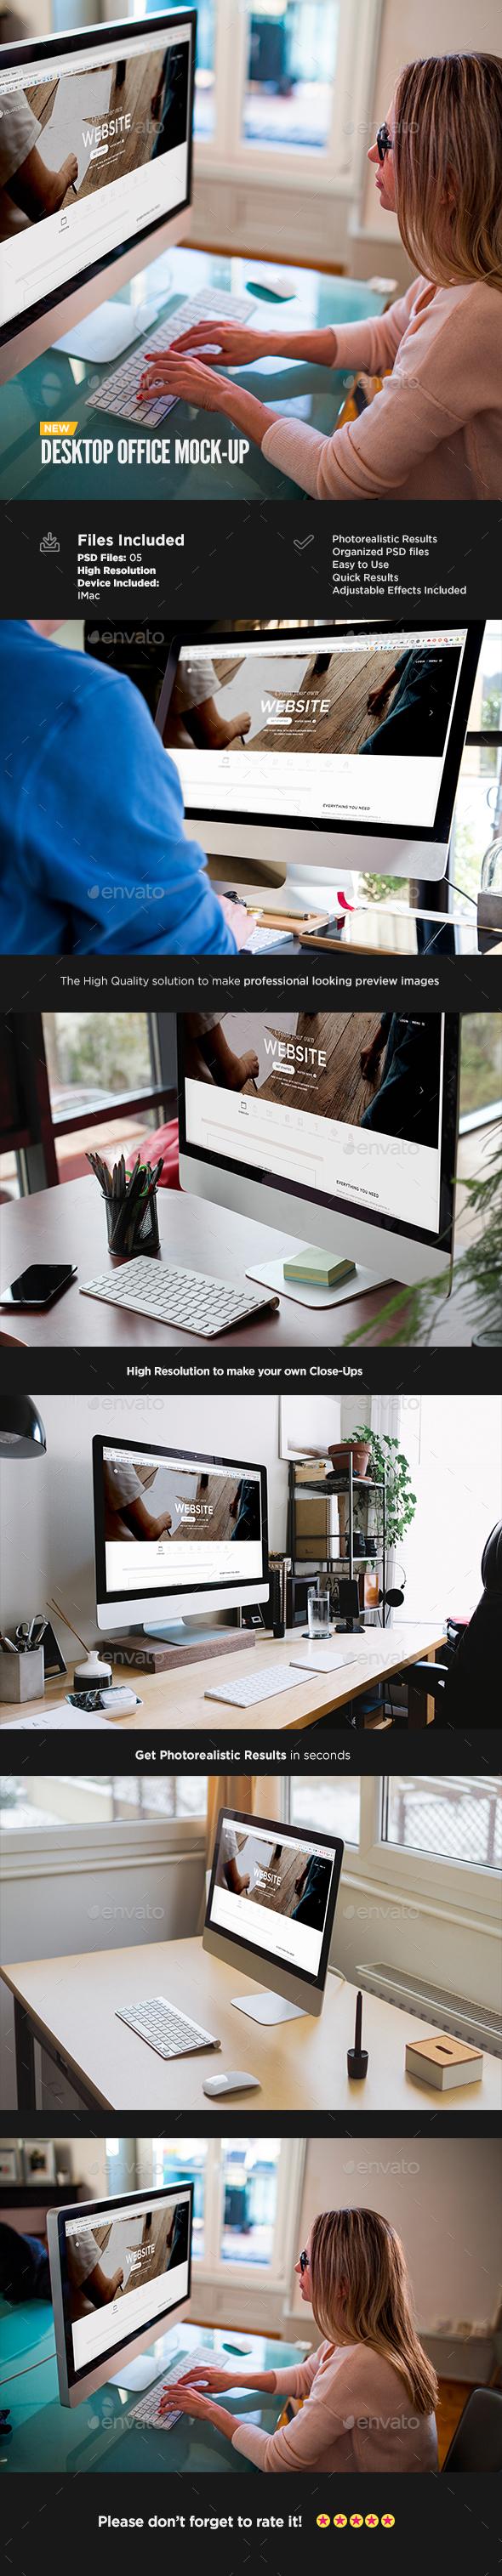 Desktop Display Mock-Up | Workspace Edition - Displays Product Mock-Ups